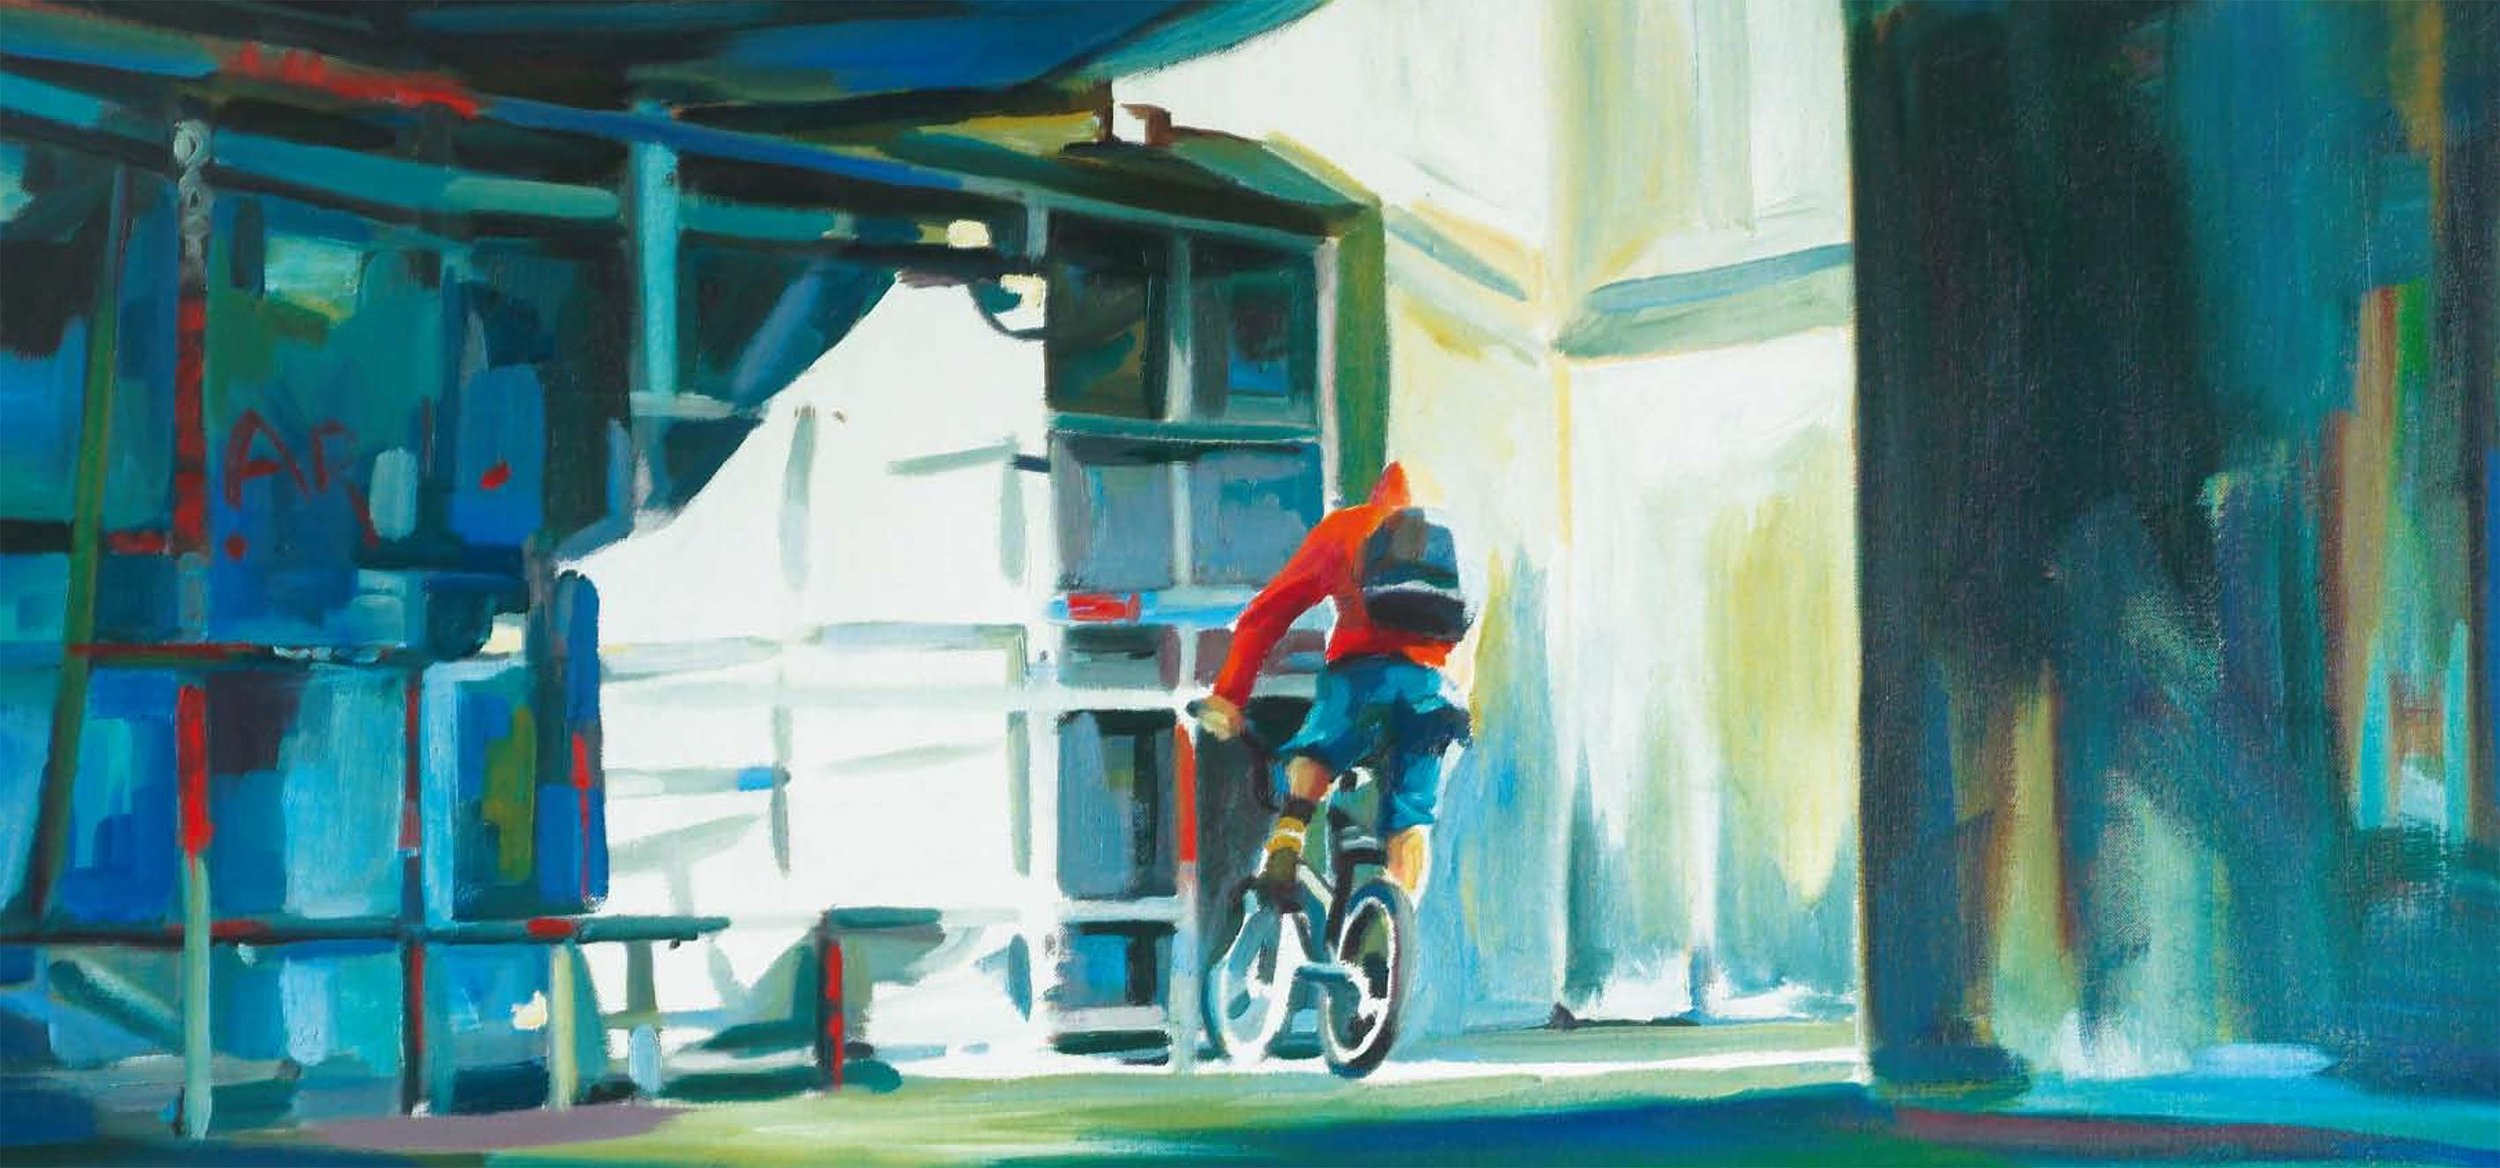 Felix-Eckardt_paintings_underhebridge_zoom.jpg